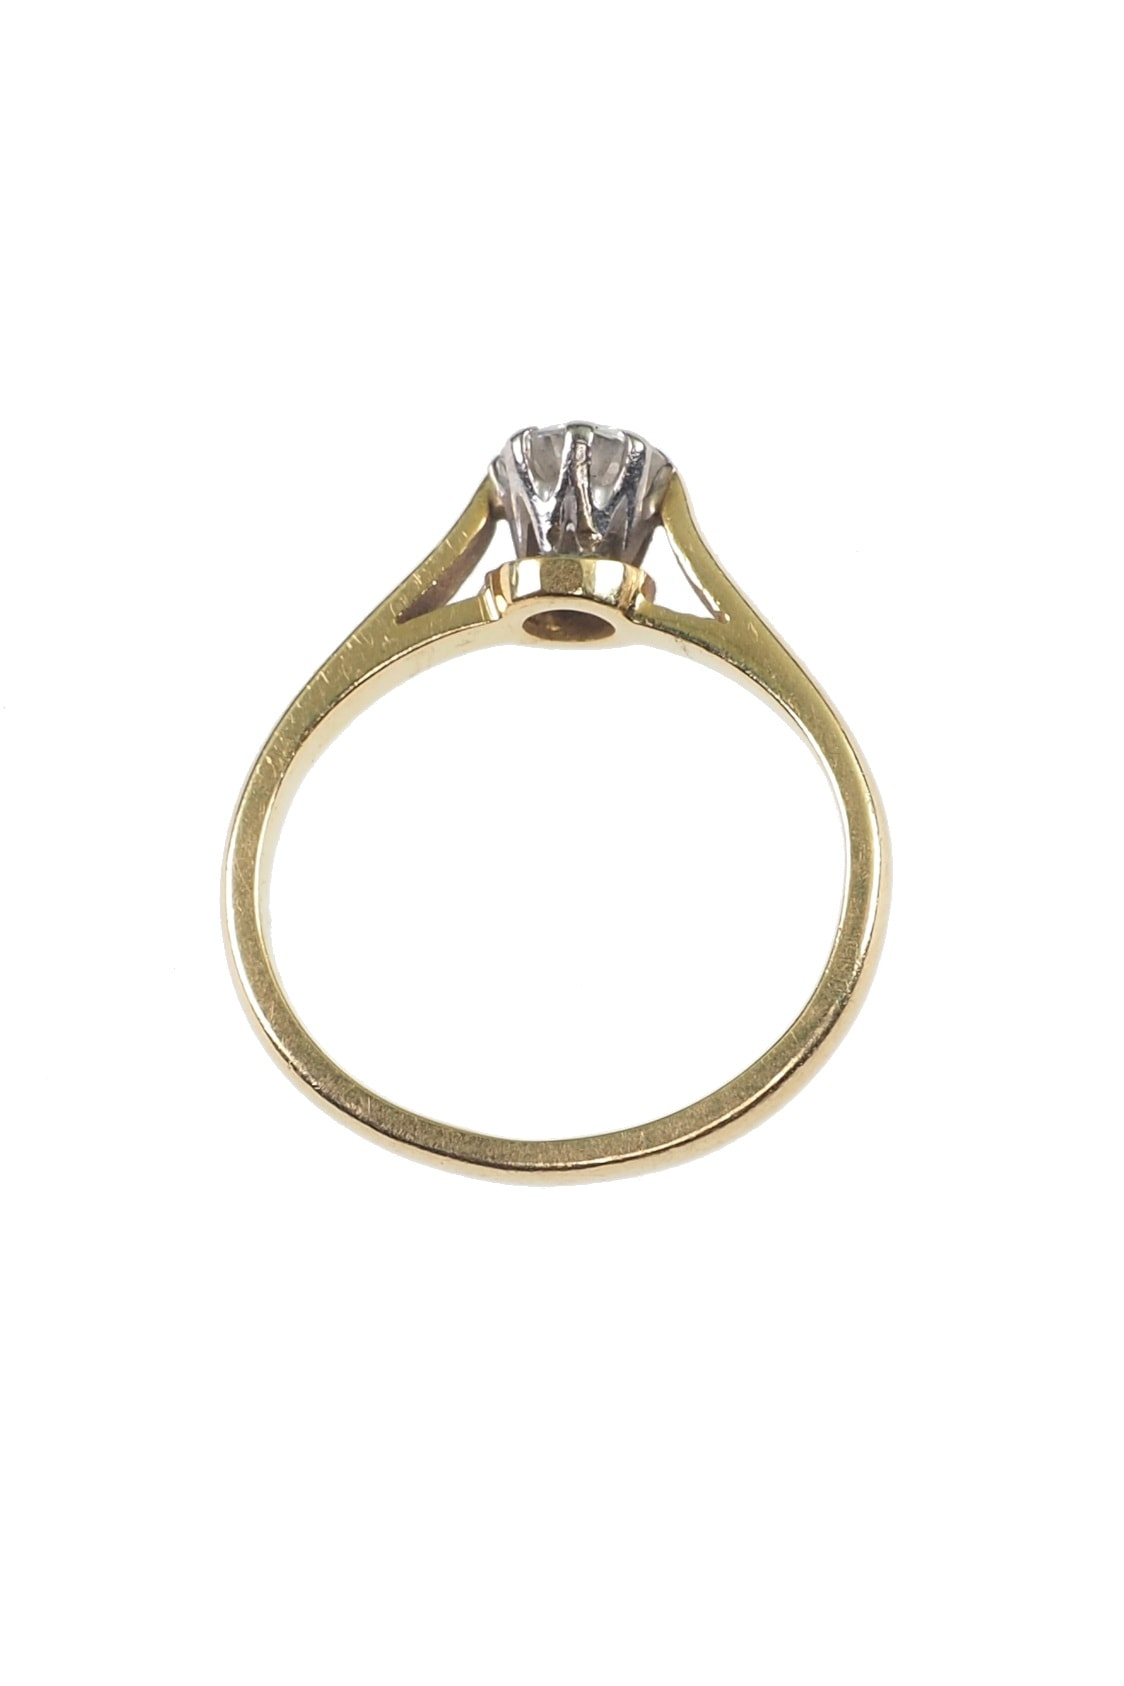 antike-Diamantringe-kaufen-2465b